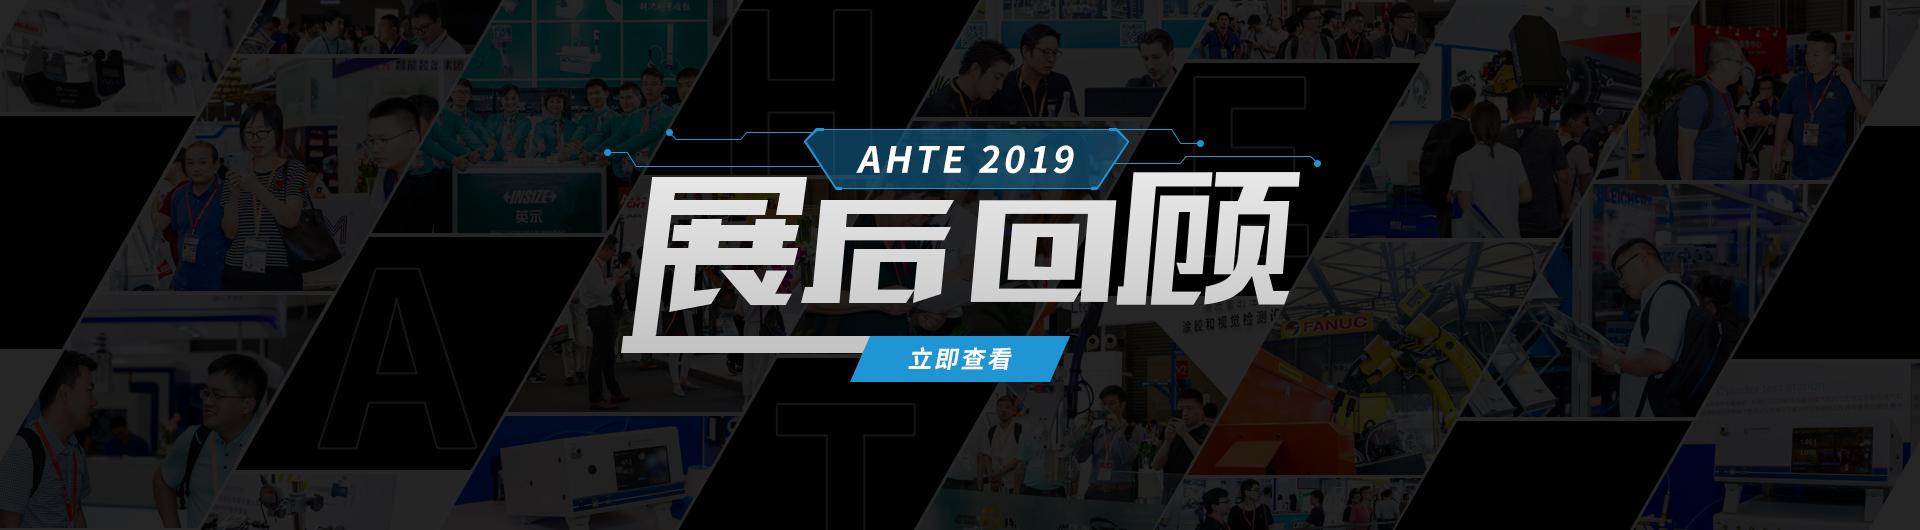 AHTE 2019 展后回顾